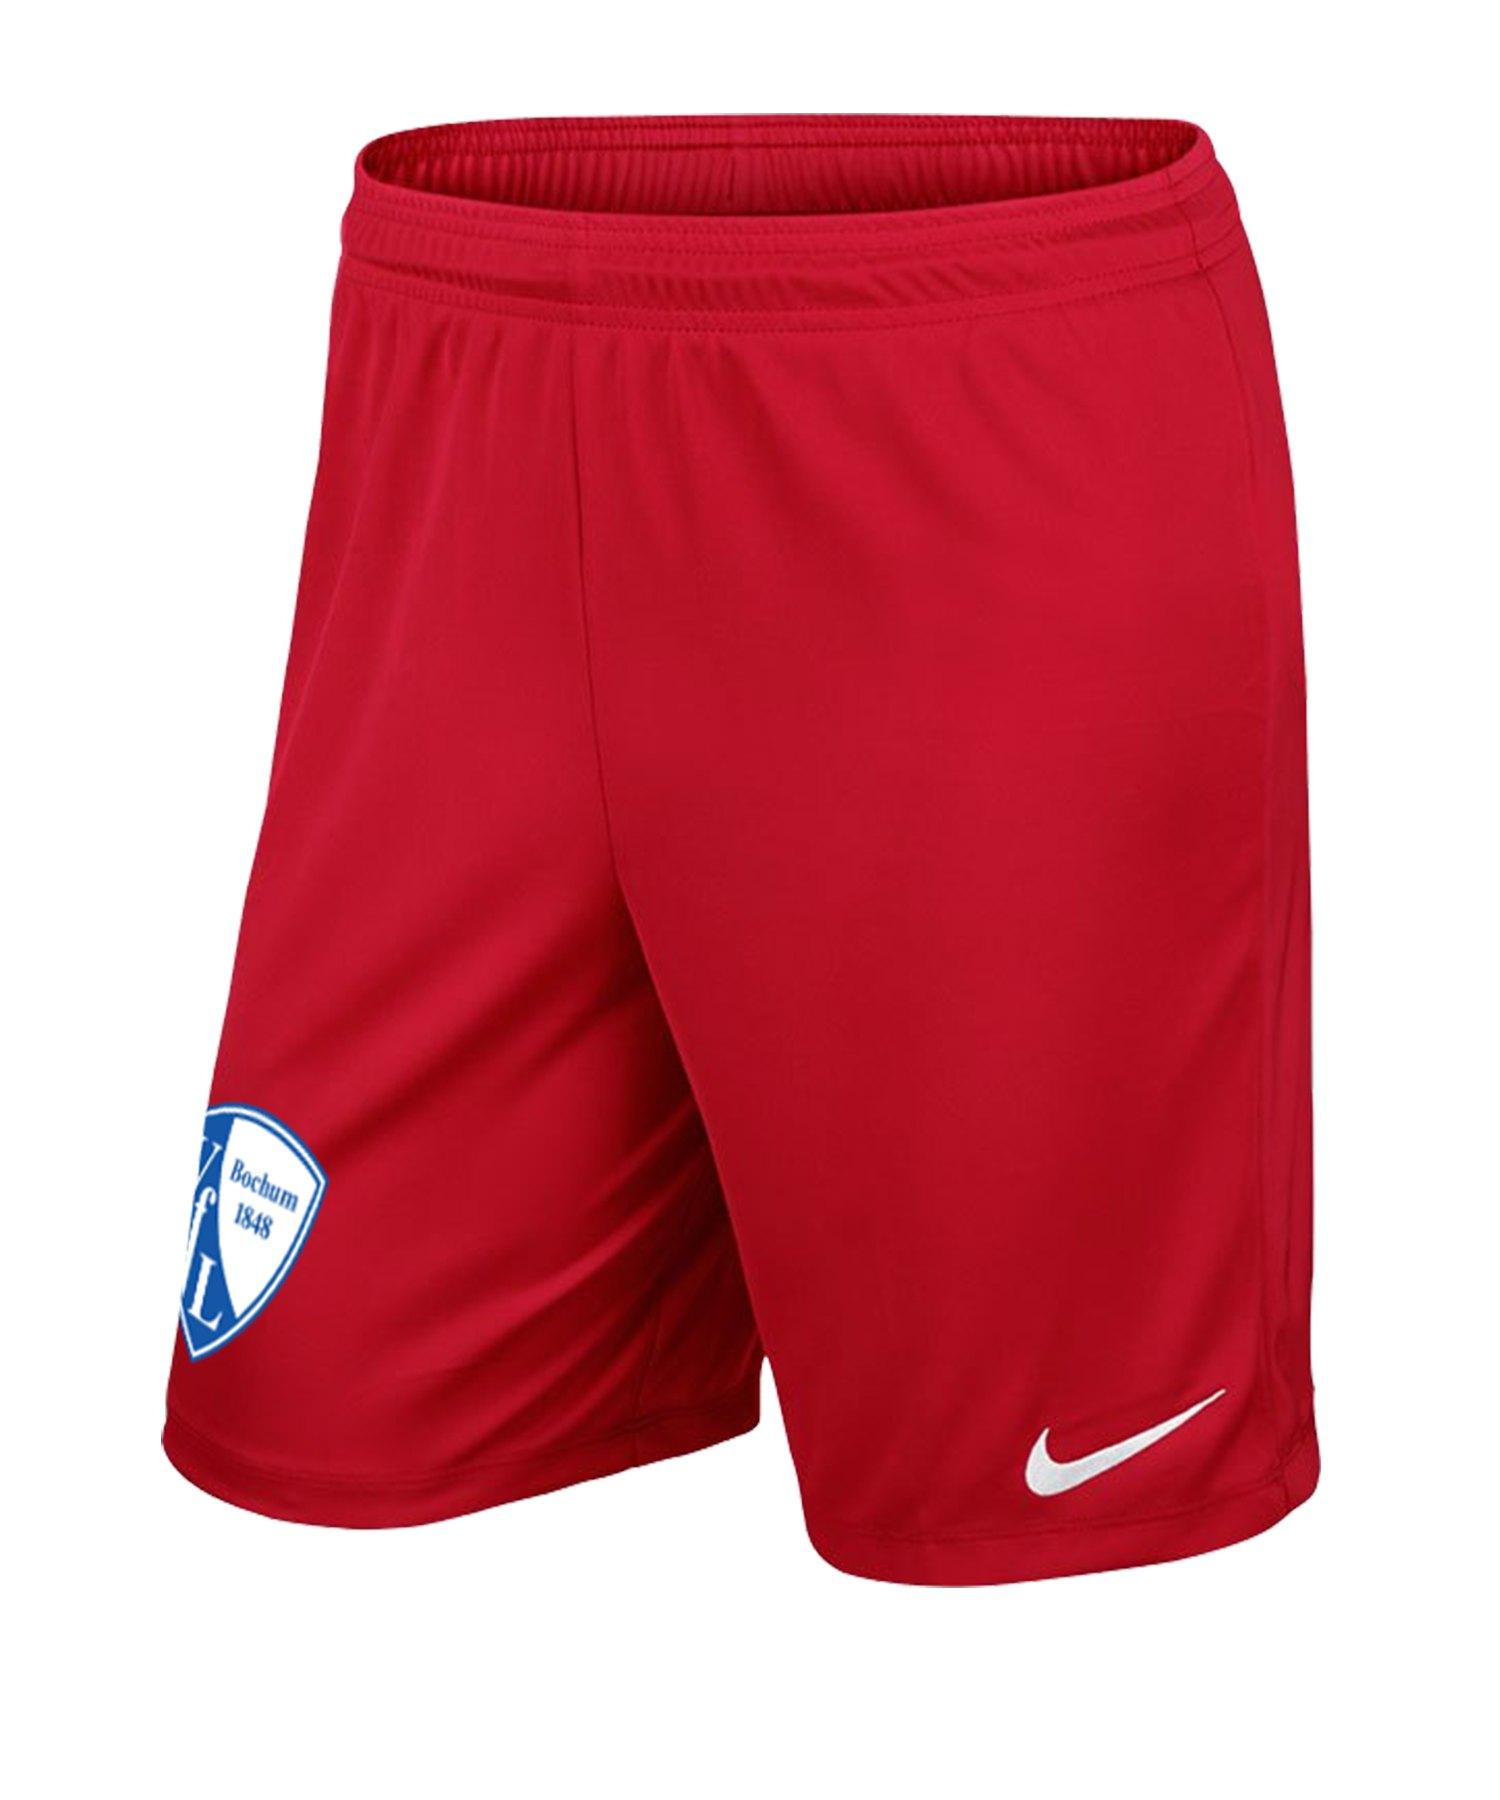 Nike VfL Bochum Short 3rd 20/21 Kids Rot F657 - rot